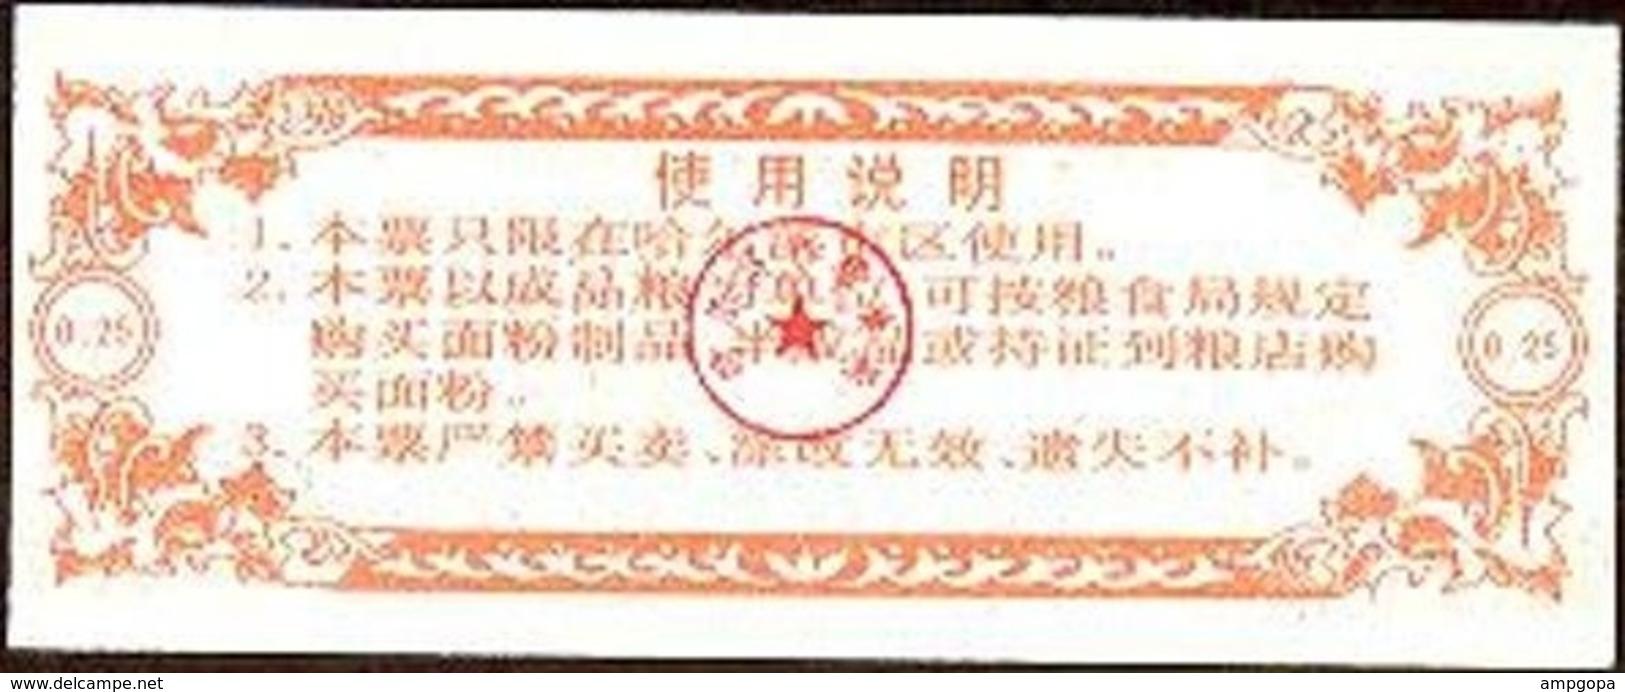 China (CUPONES) 0.25 Kilos 1991 Harbin (Heilongjiang) Cn 23 H2.00250 UNC - China